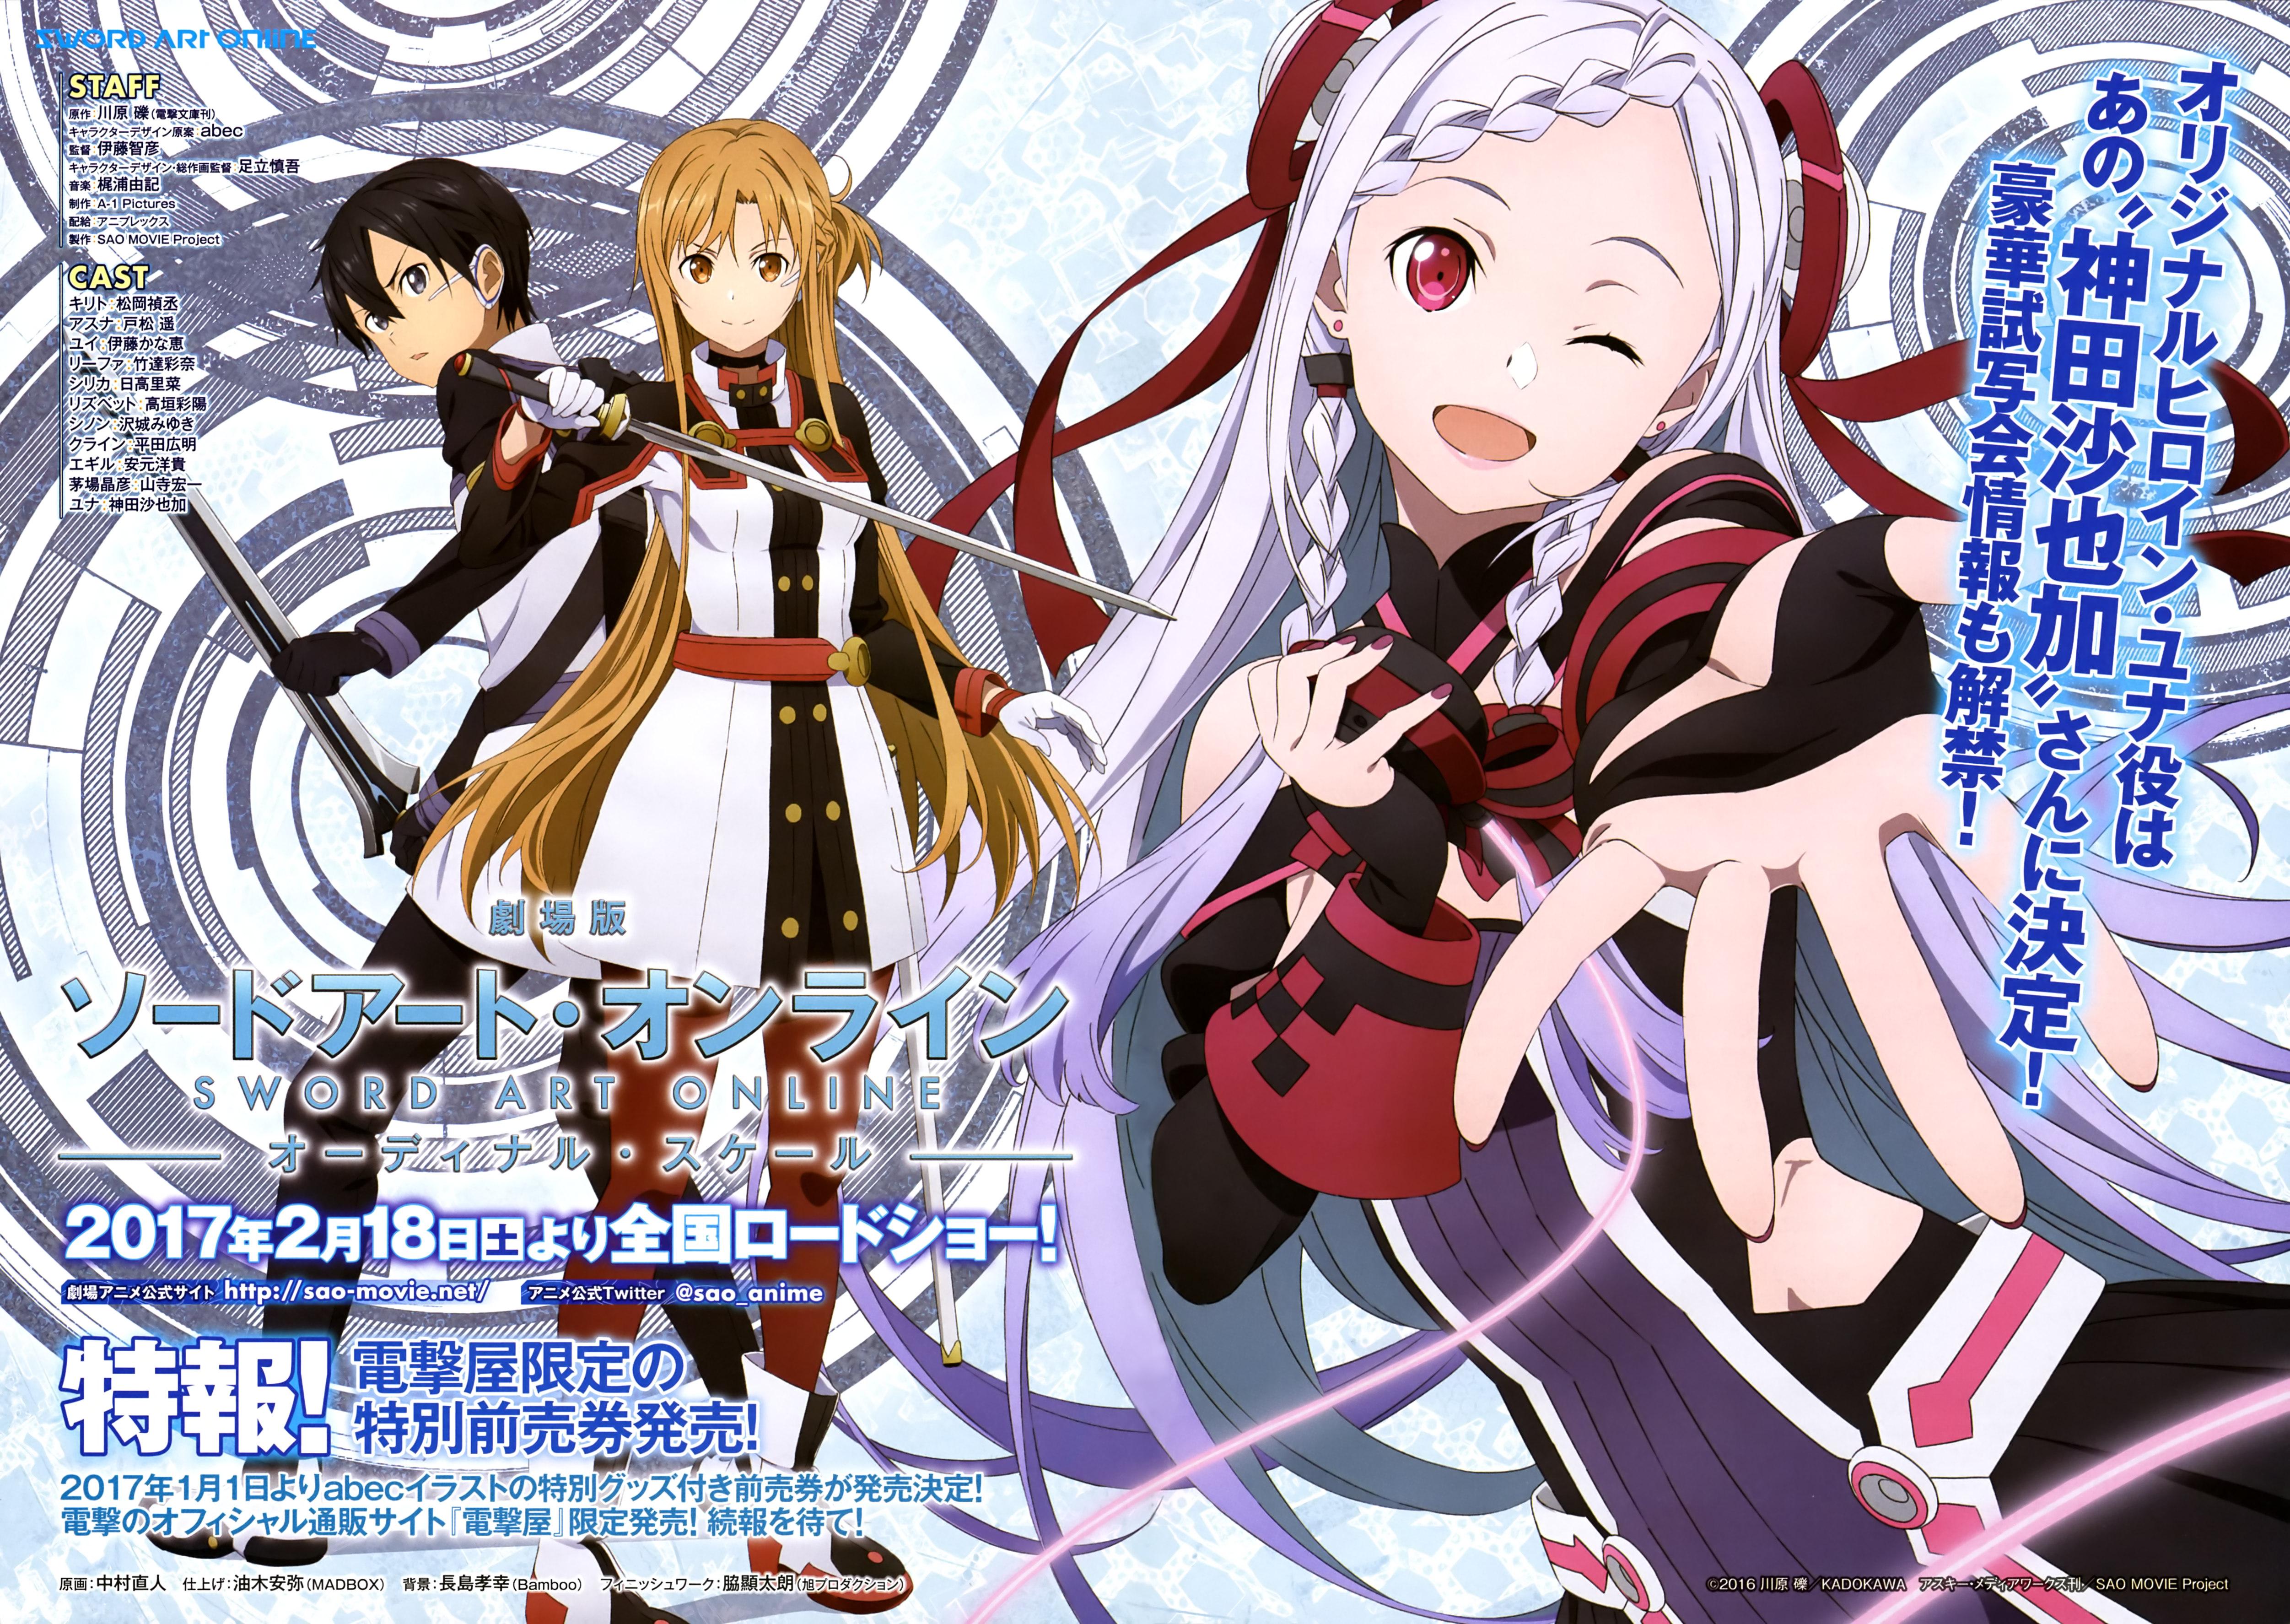 Sword art online season 2 fairy hd wallpaper, background images.